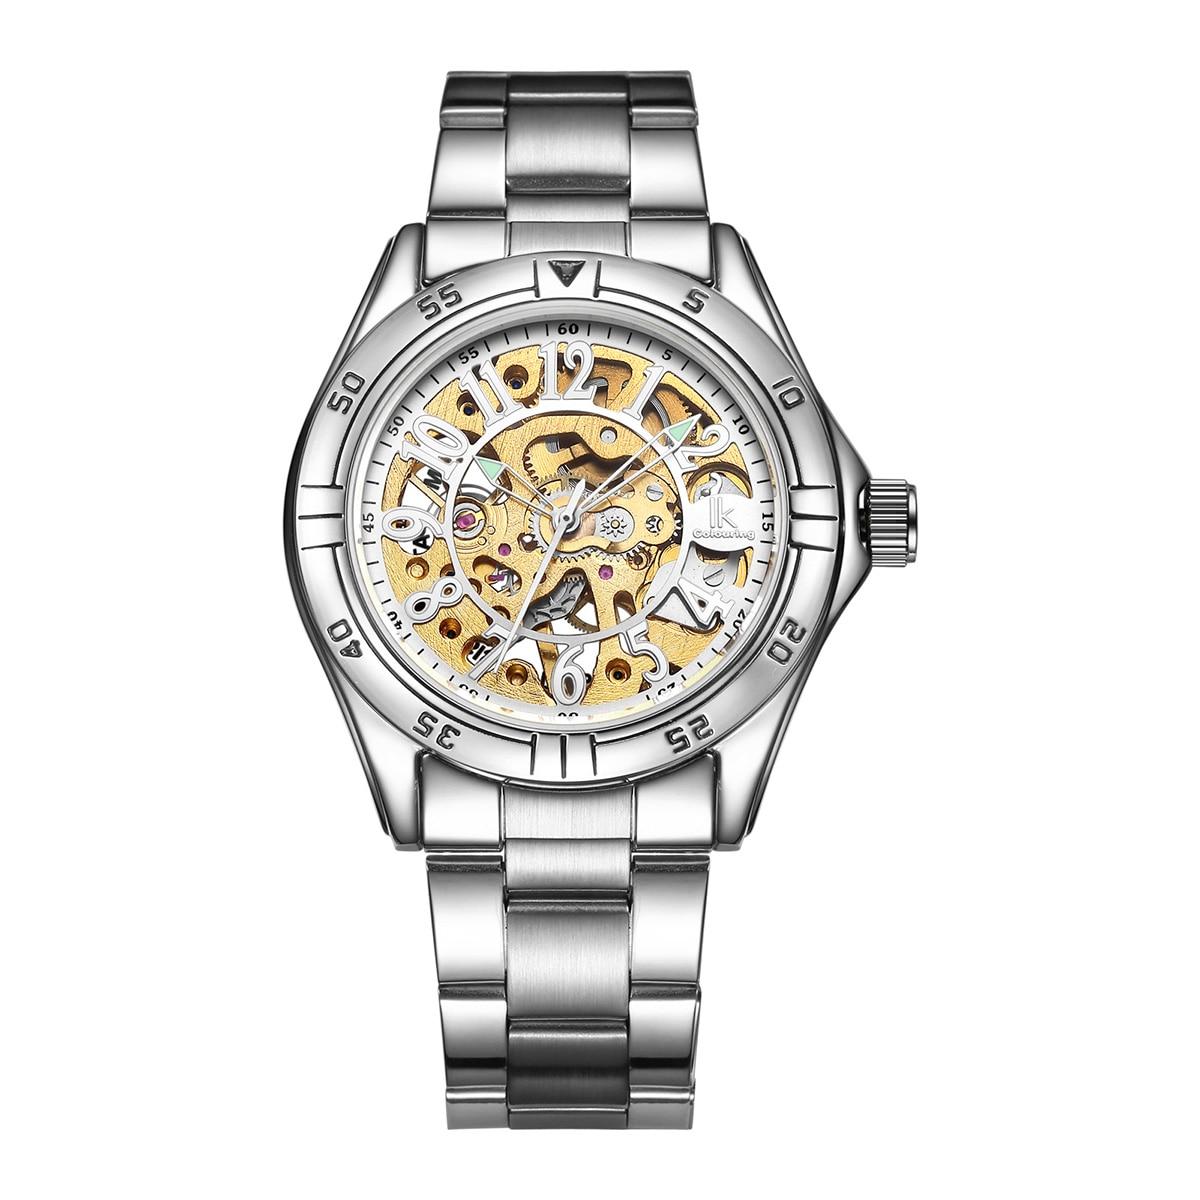 2020 New Manual Mechanical Men's Wind Watch Fashion Casual Stainless Steel Strap Hollow Waterproof Men's Watch Relogio Masculino